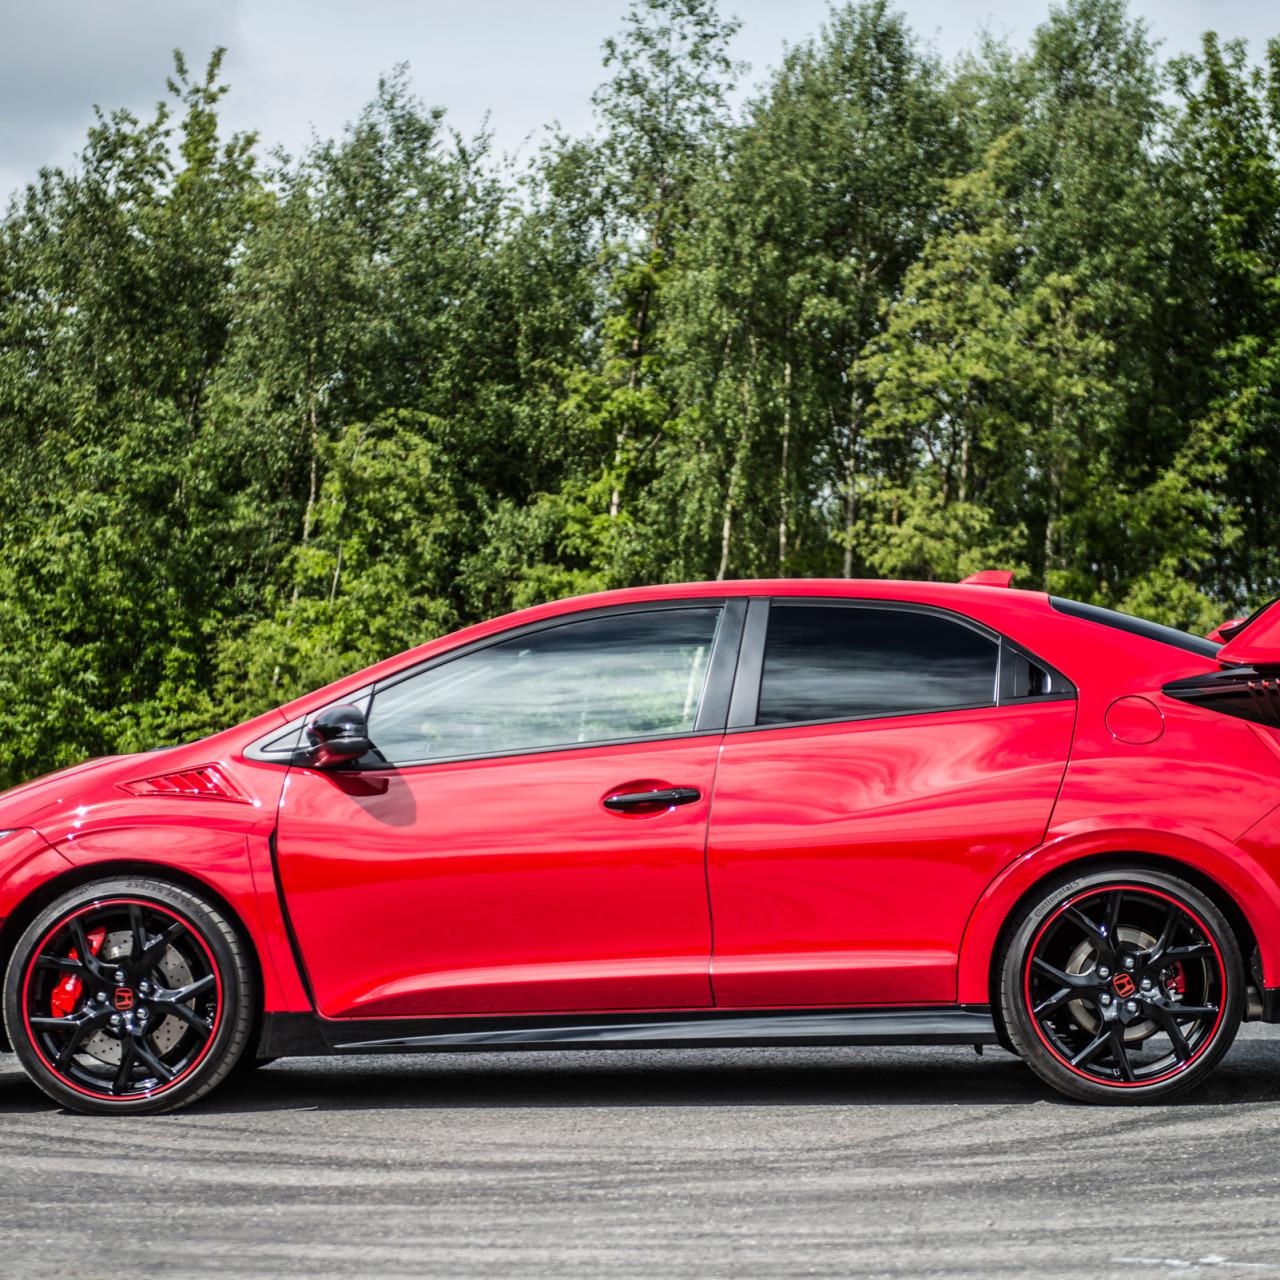 Civic Type R Red RHD HD Wallpaper 6245 1280x1280